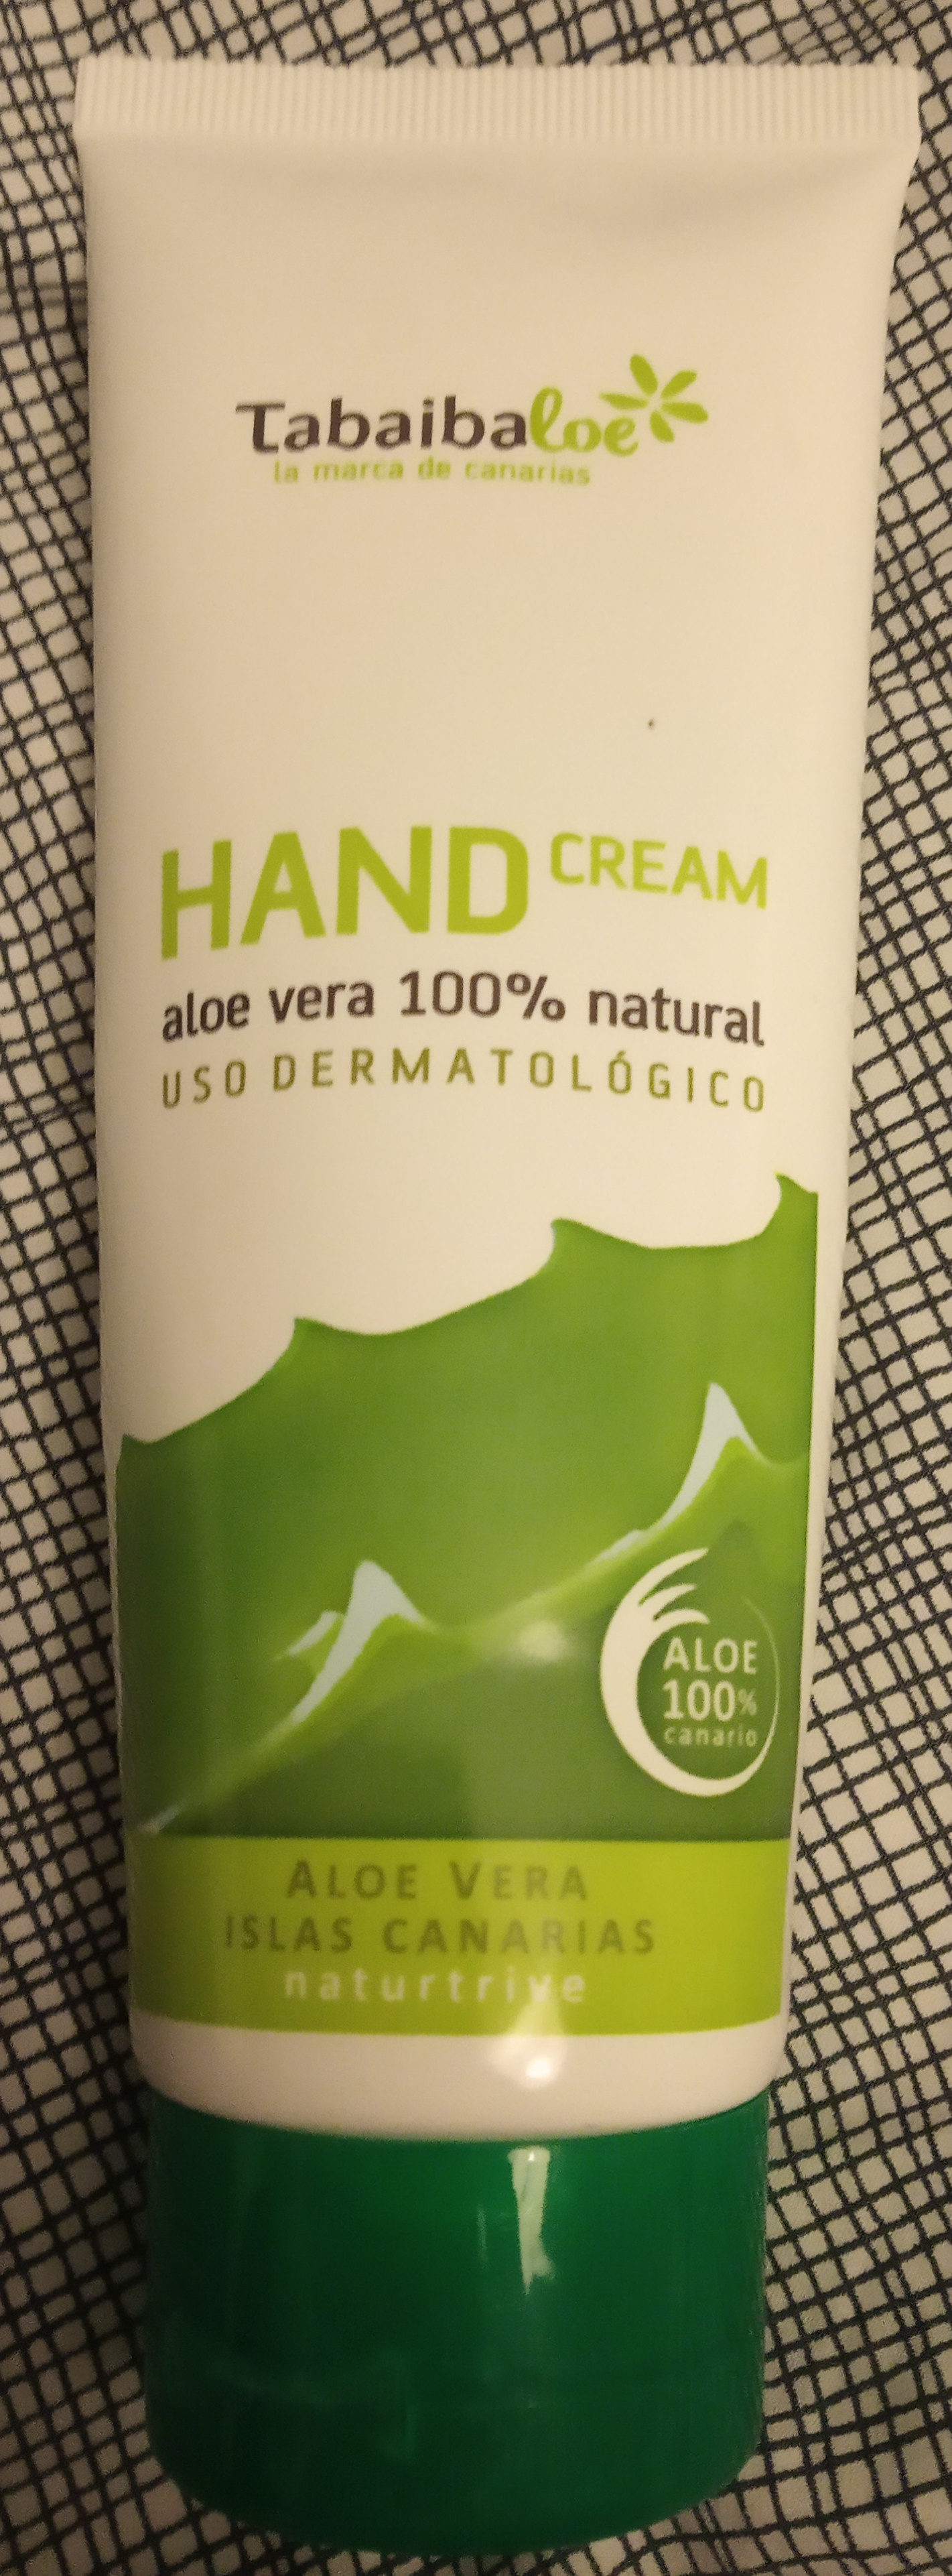 Tabaibaloe Handcream - Product - es